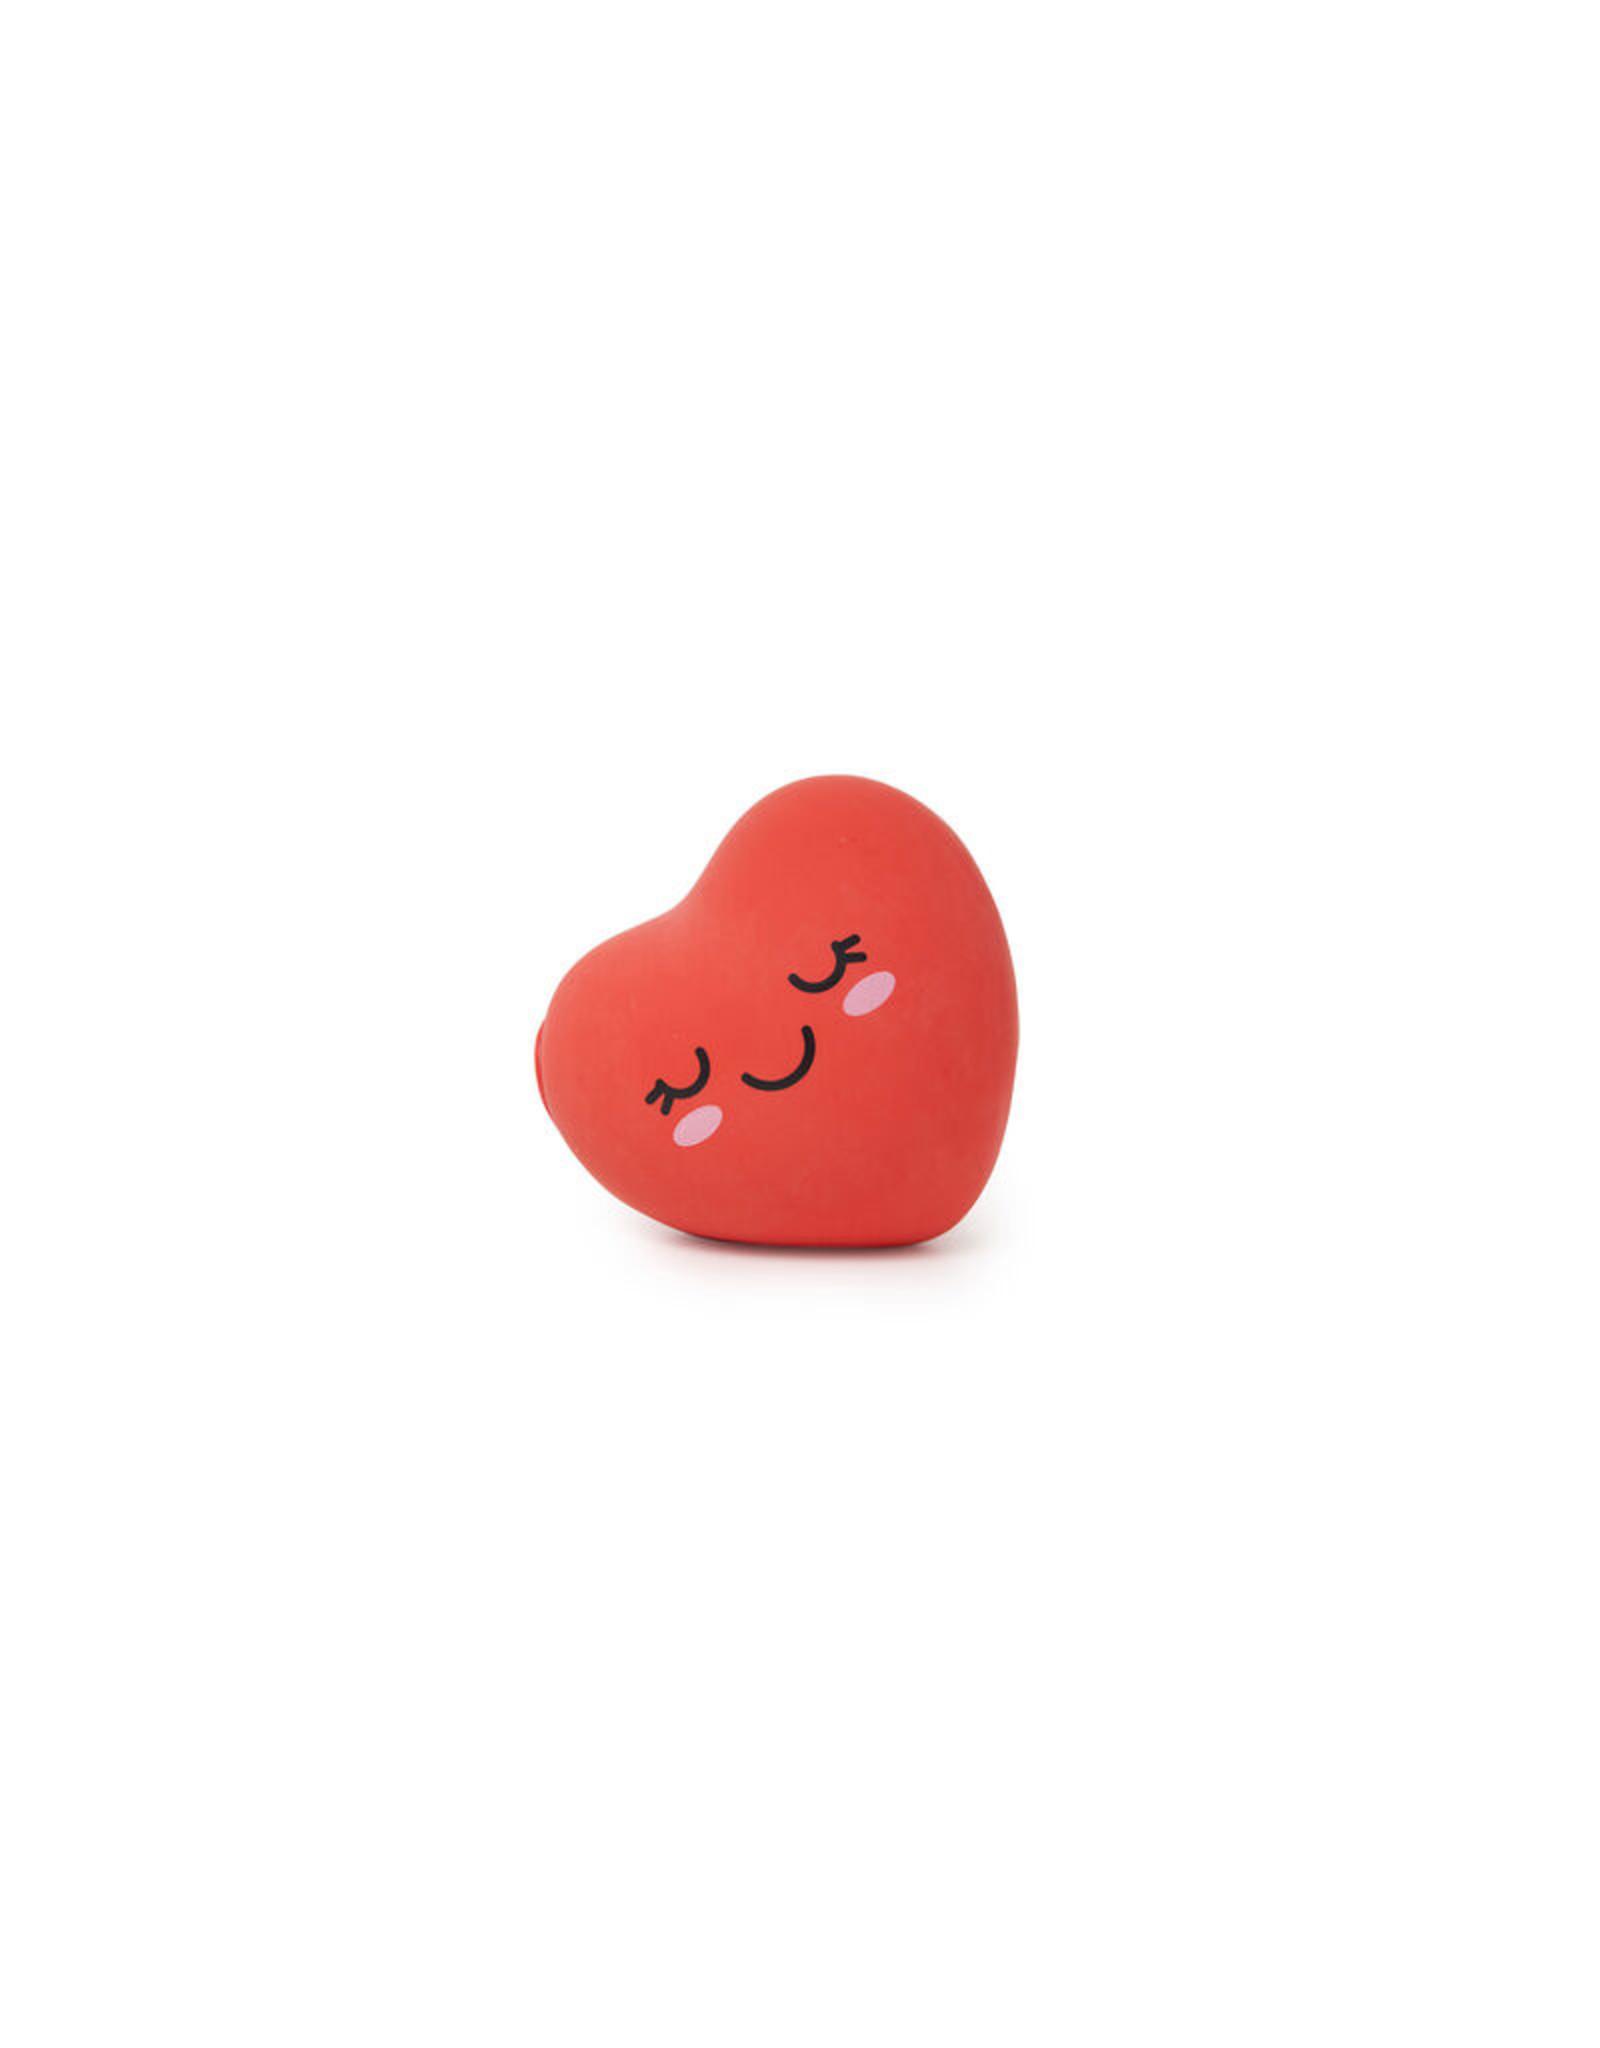 Legami stress ball - heart